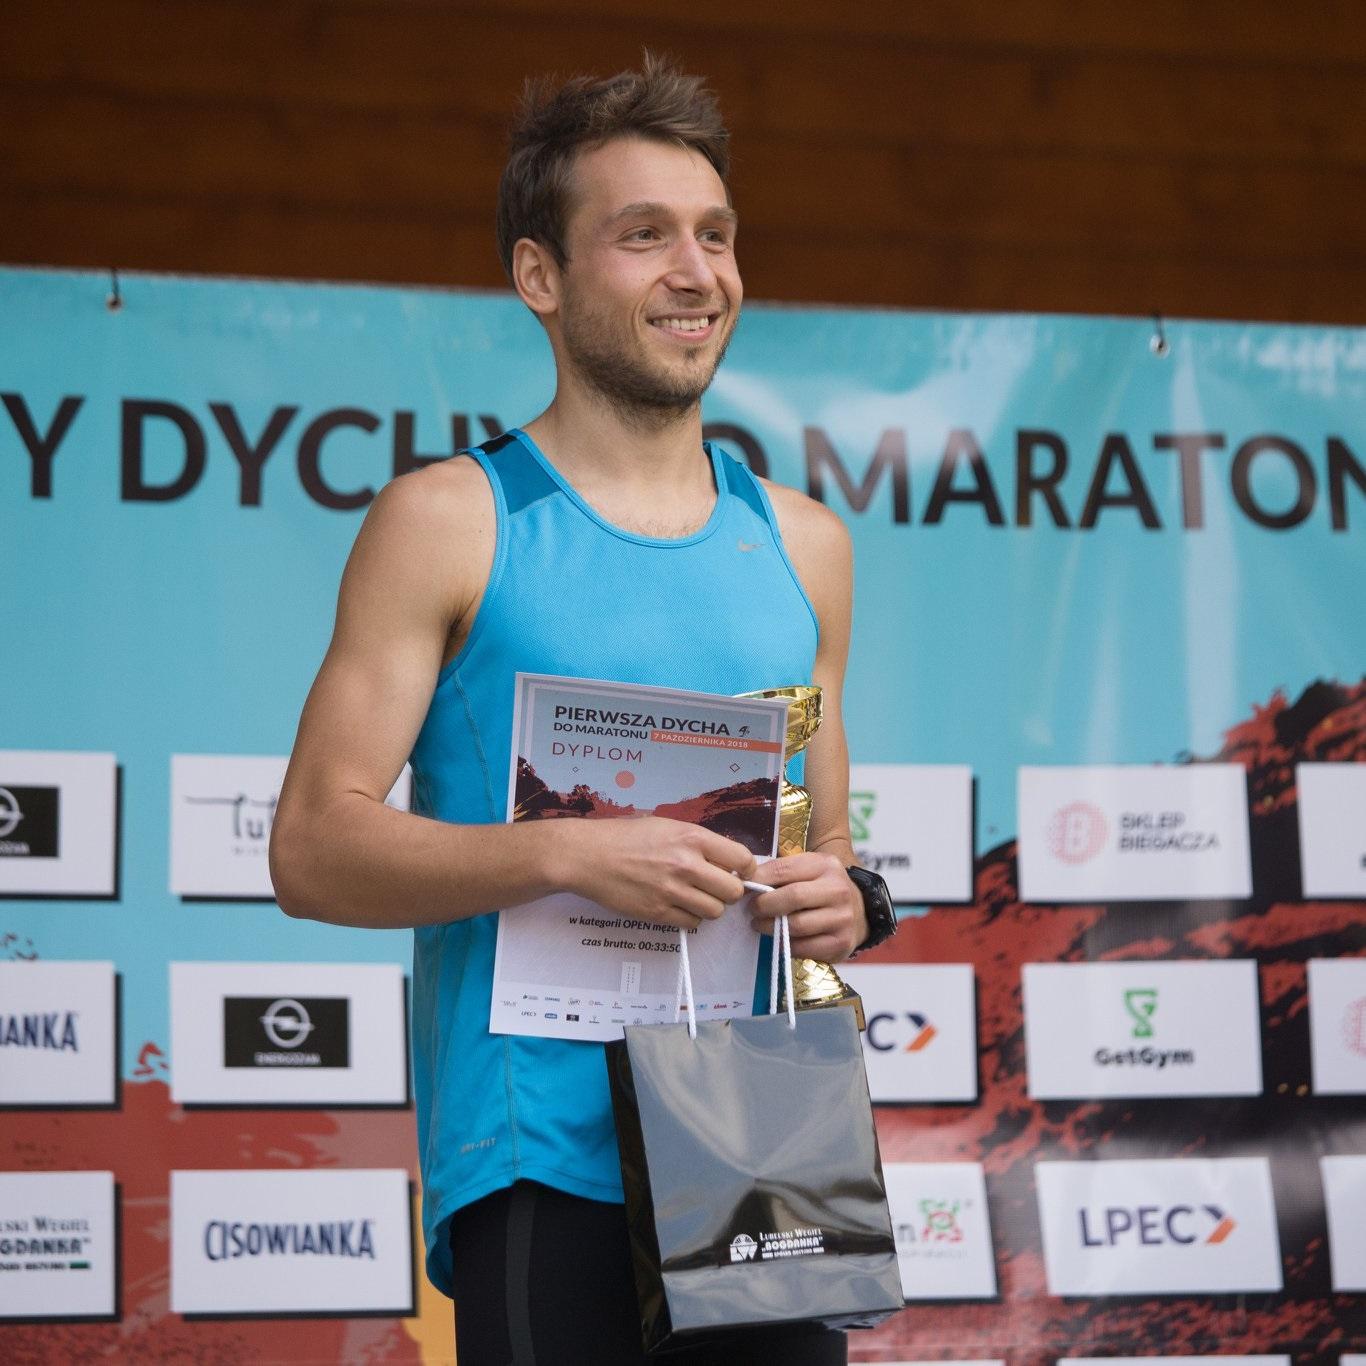 I Dycha do Maratonu 2018 (2 miejsce)